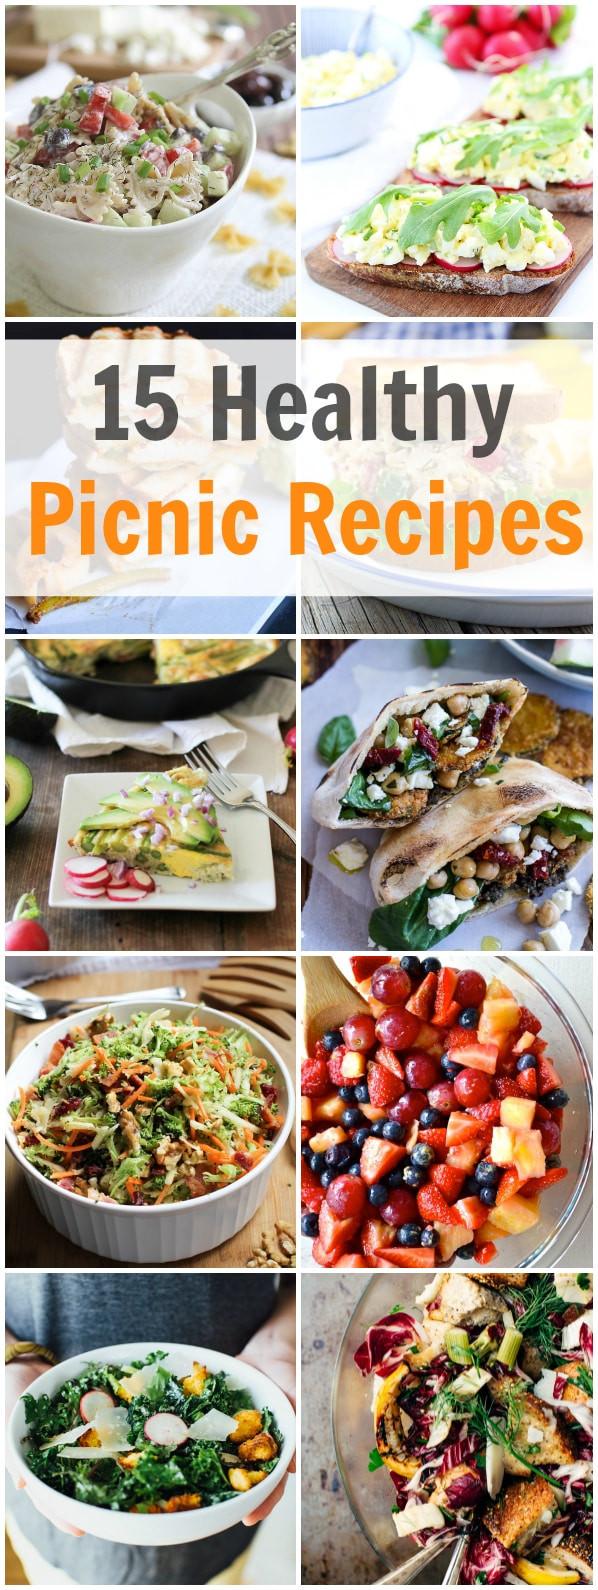 Healthy Picnic Snacks  15 Healthy Picnic Recipes Primavera Kitchen